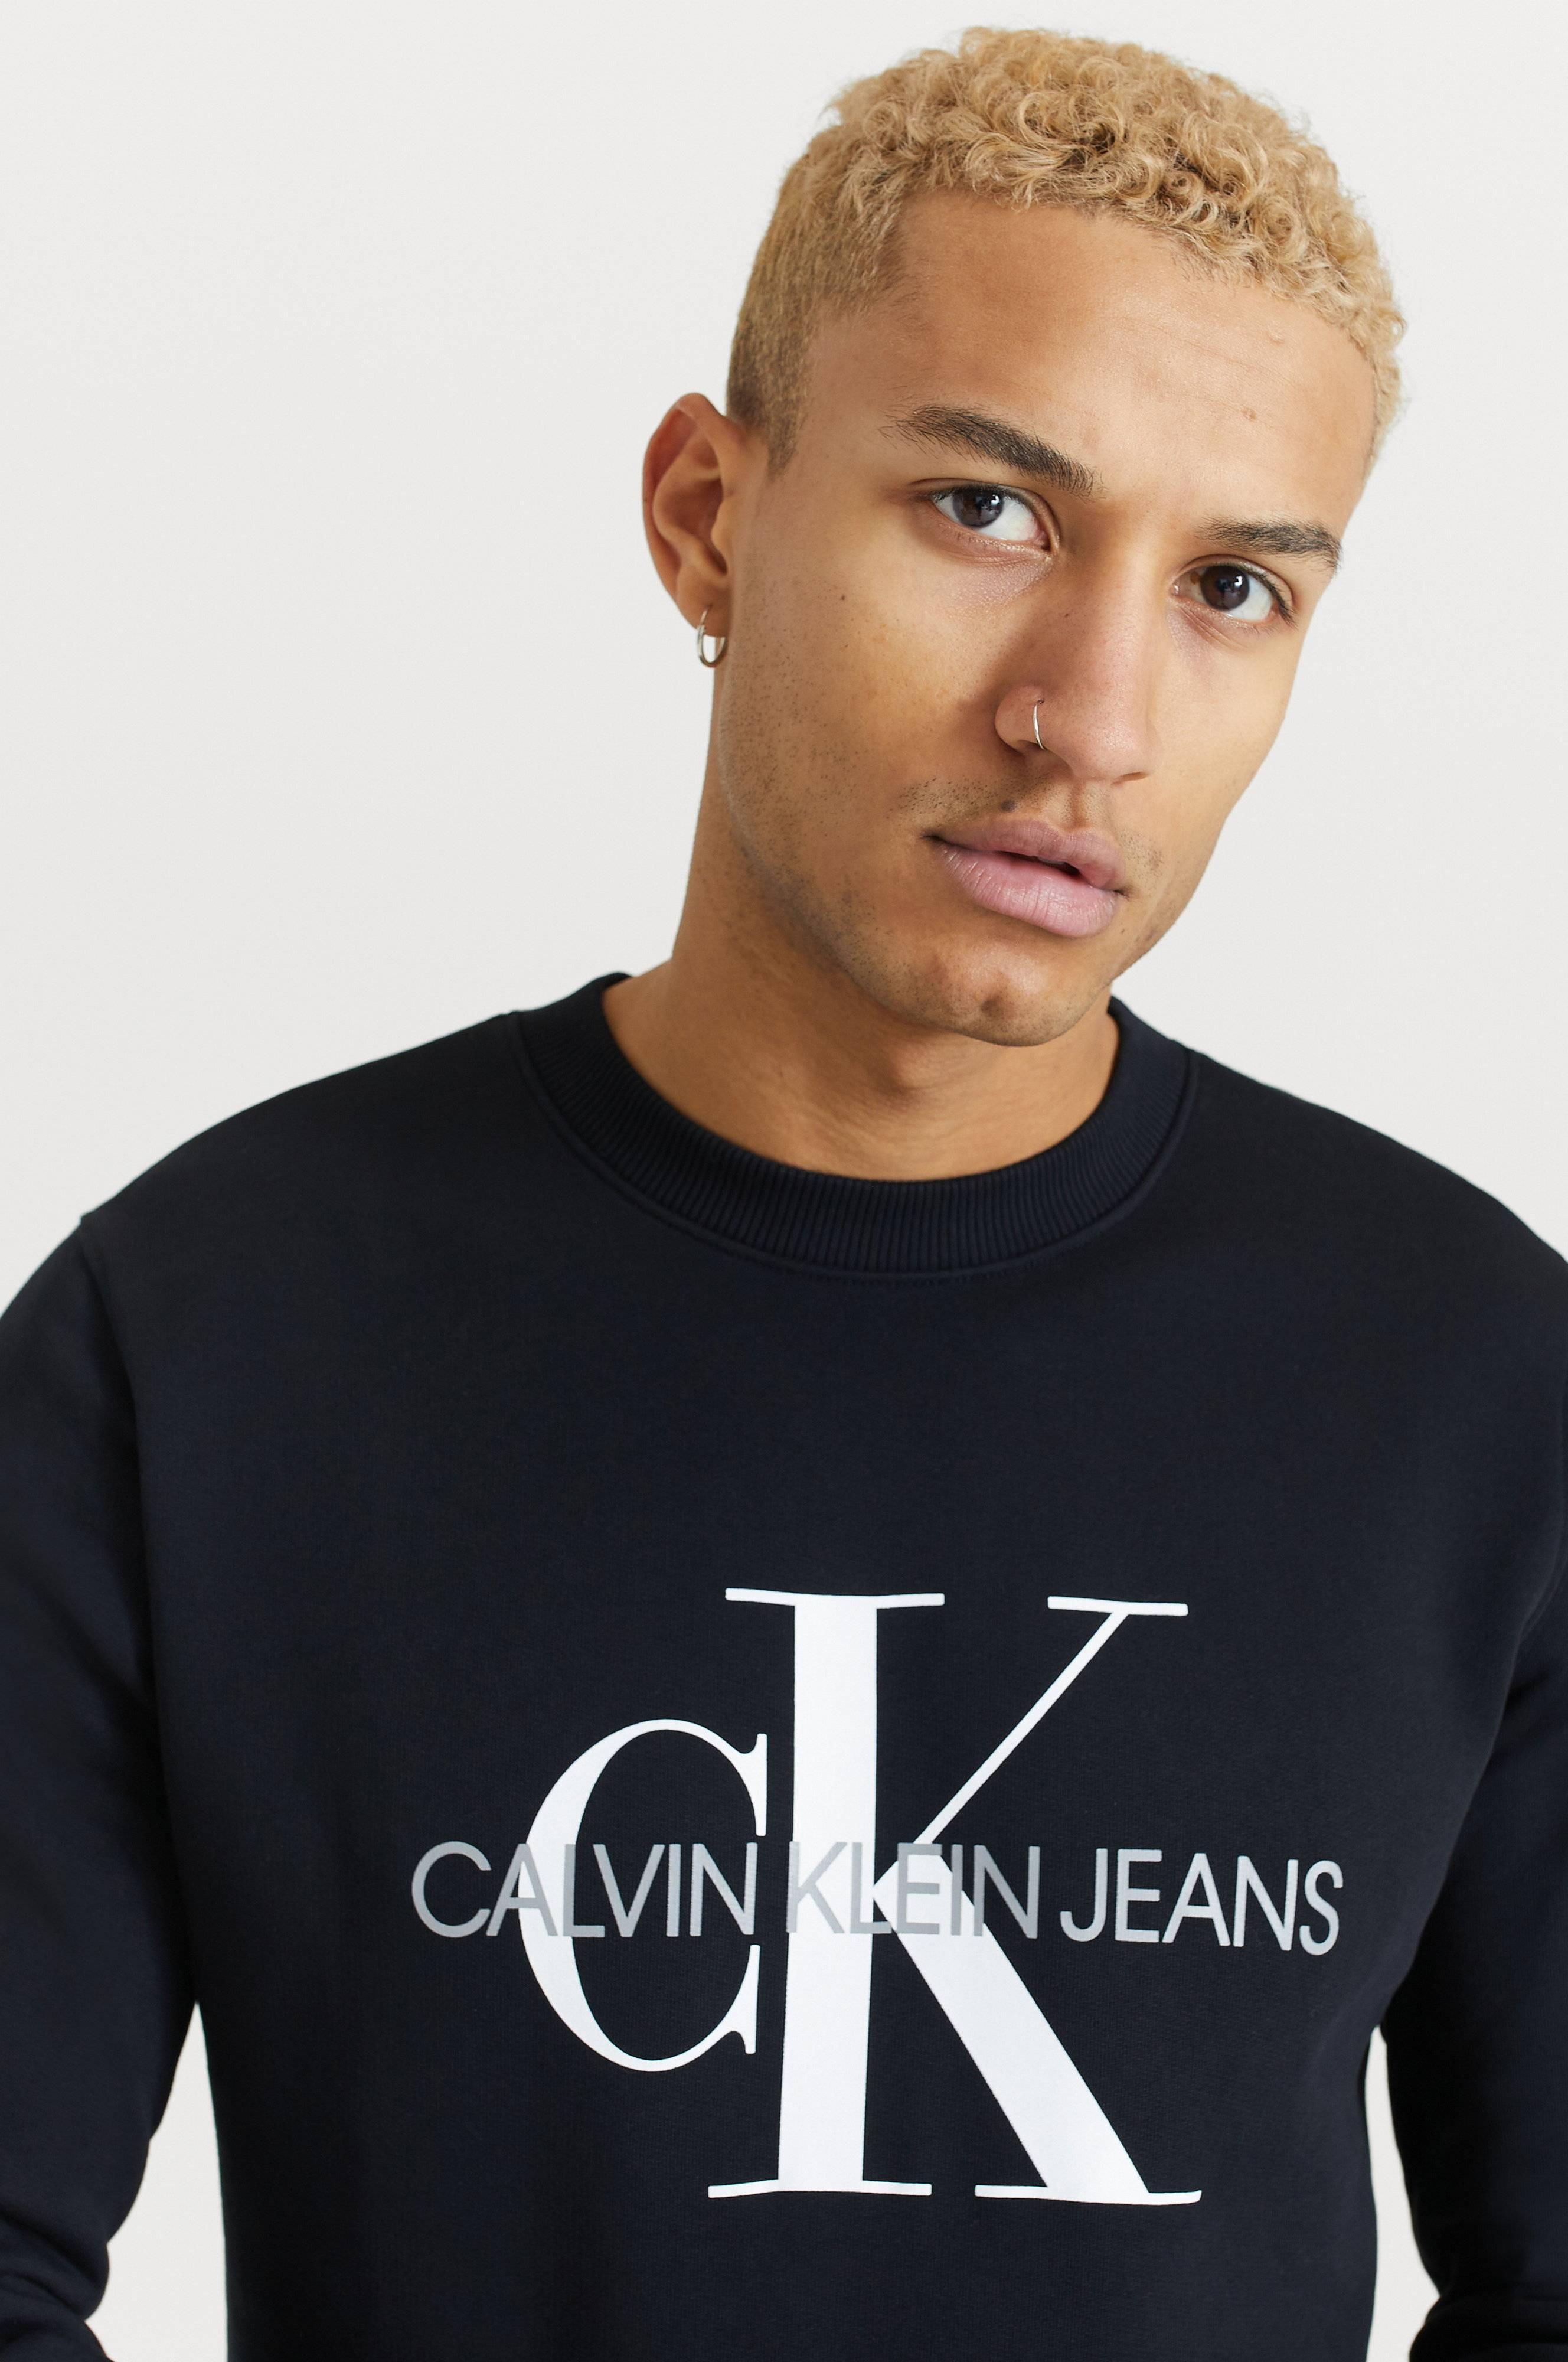 Calvin Klein Jeans Sweatshirt Iconic Monogram Crewneck Svart